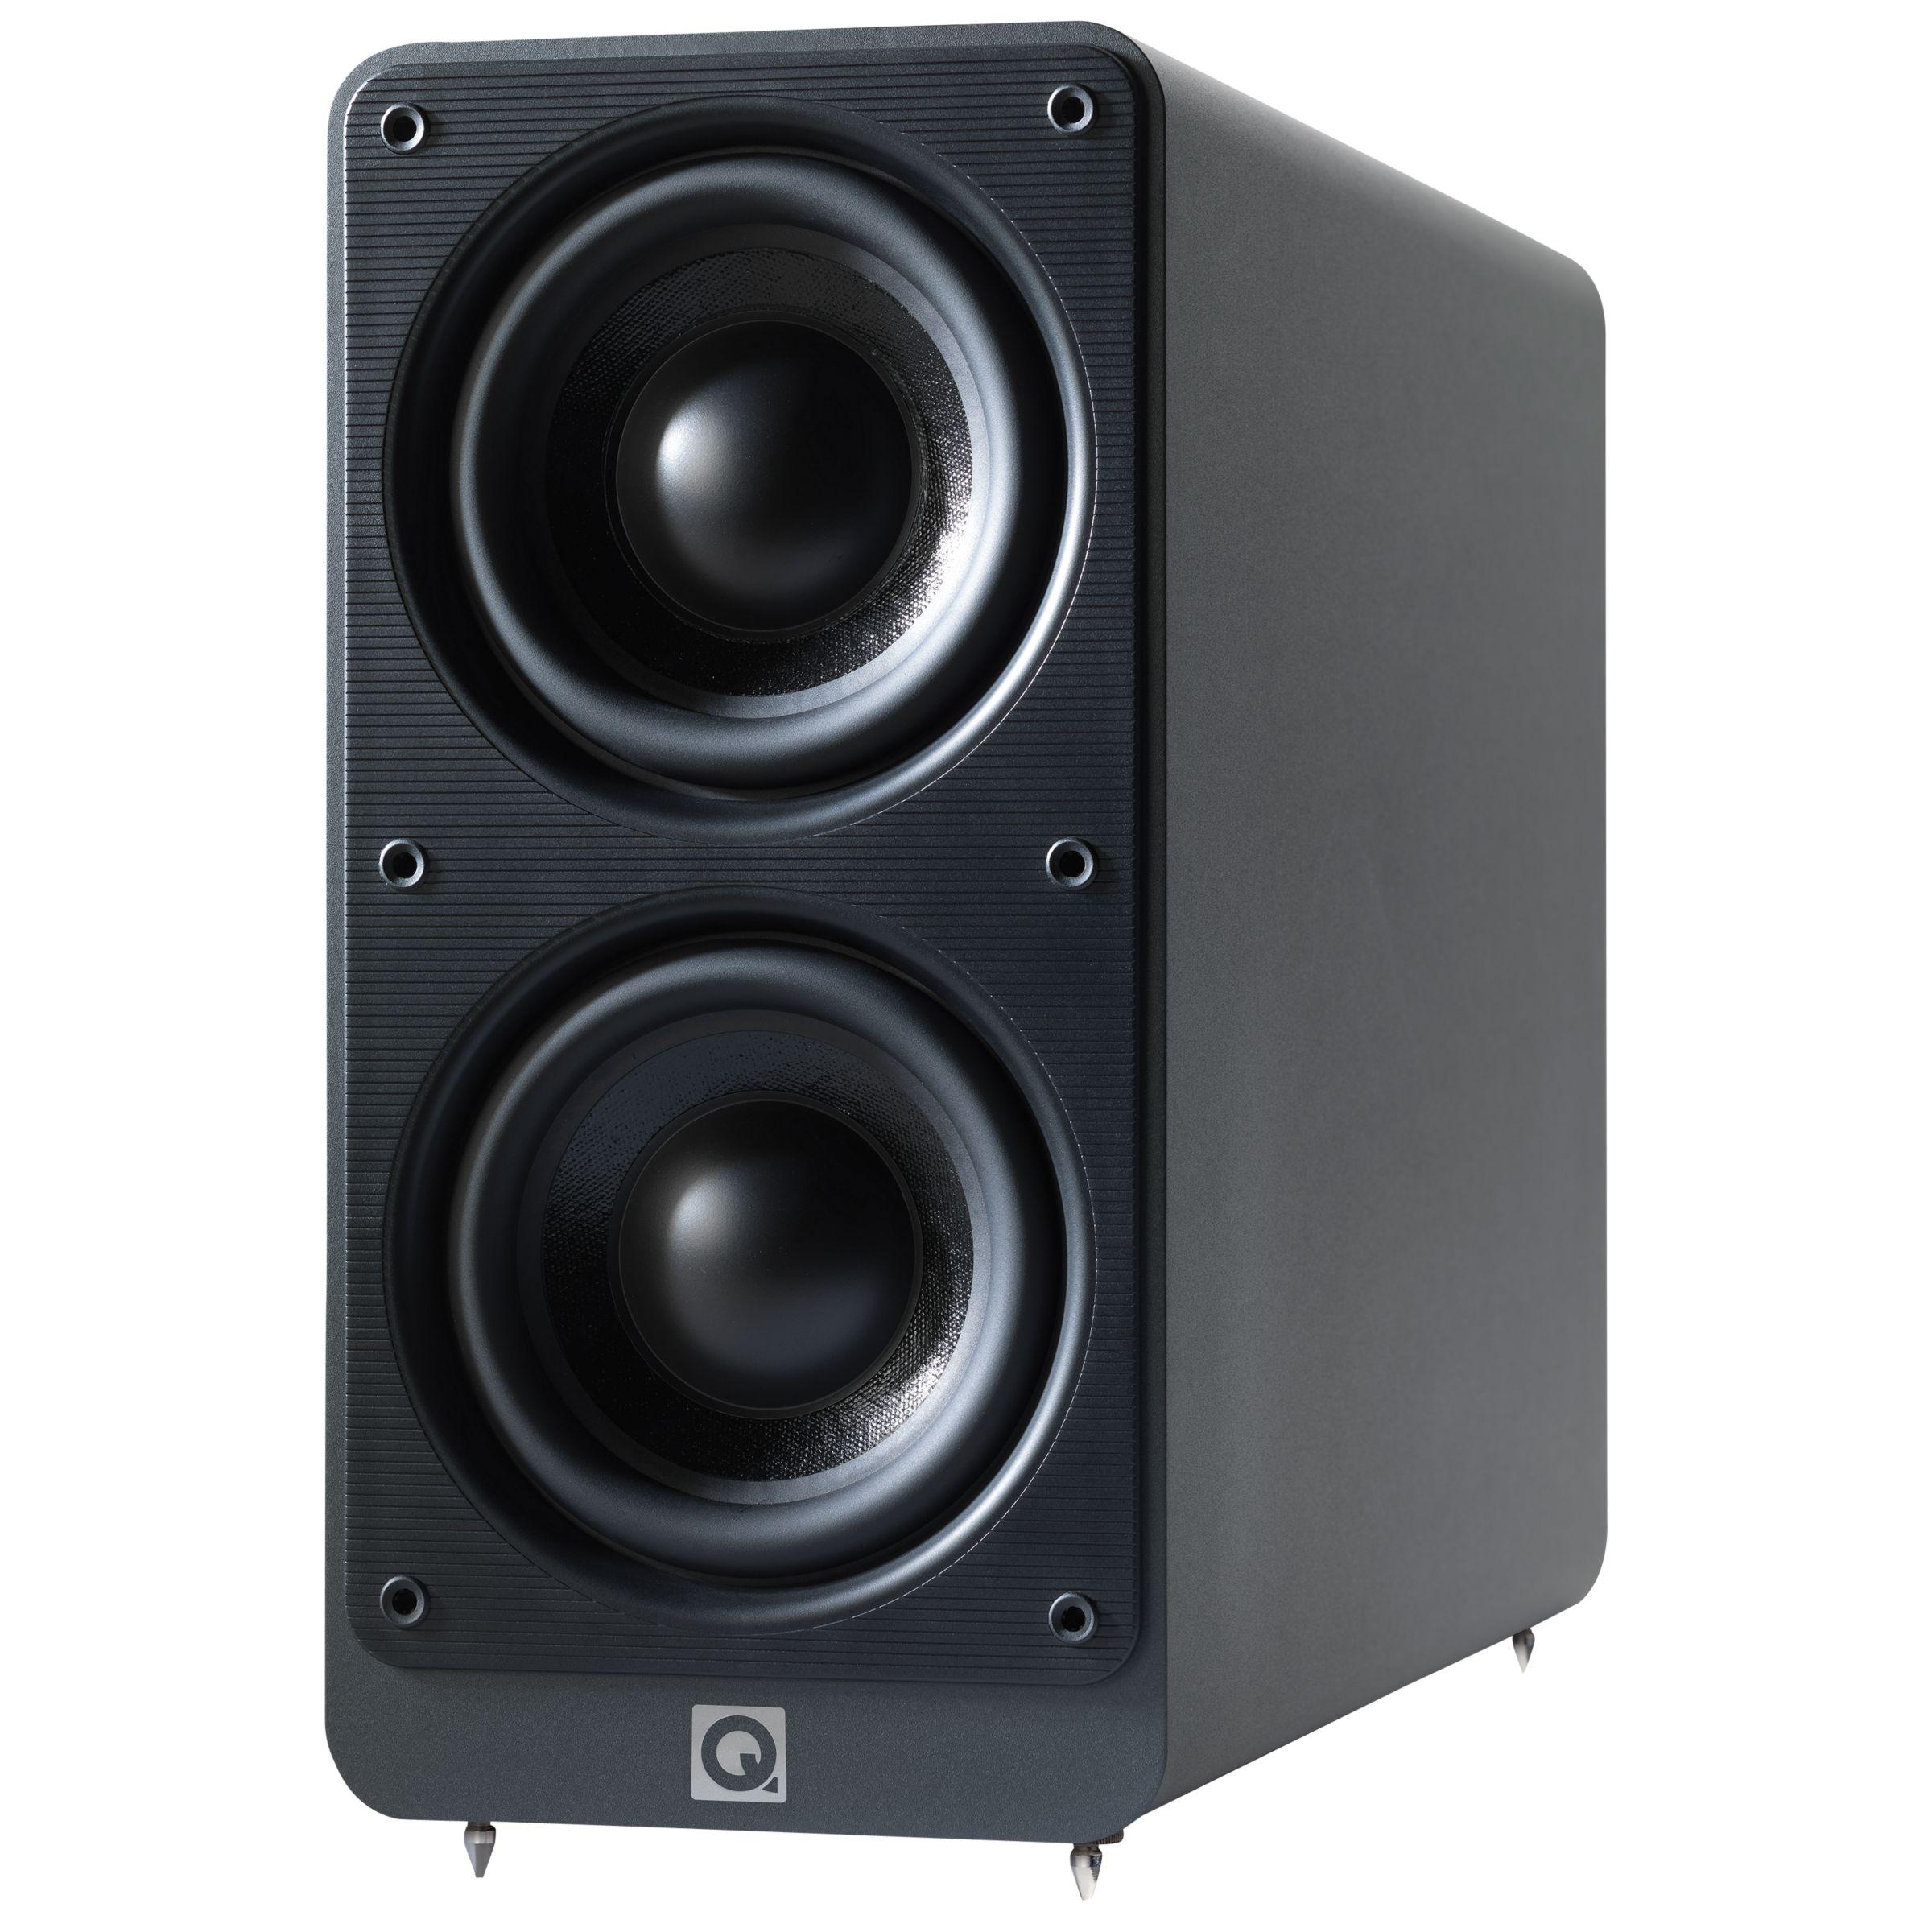 Q Acoustics Q Acoustics 2070Si Subwoofer